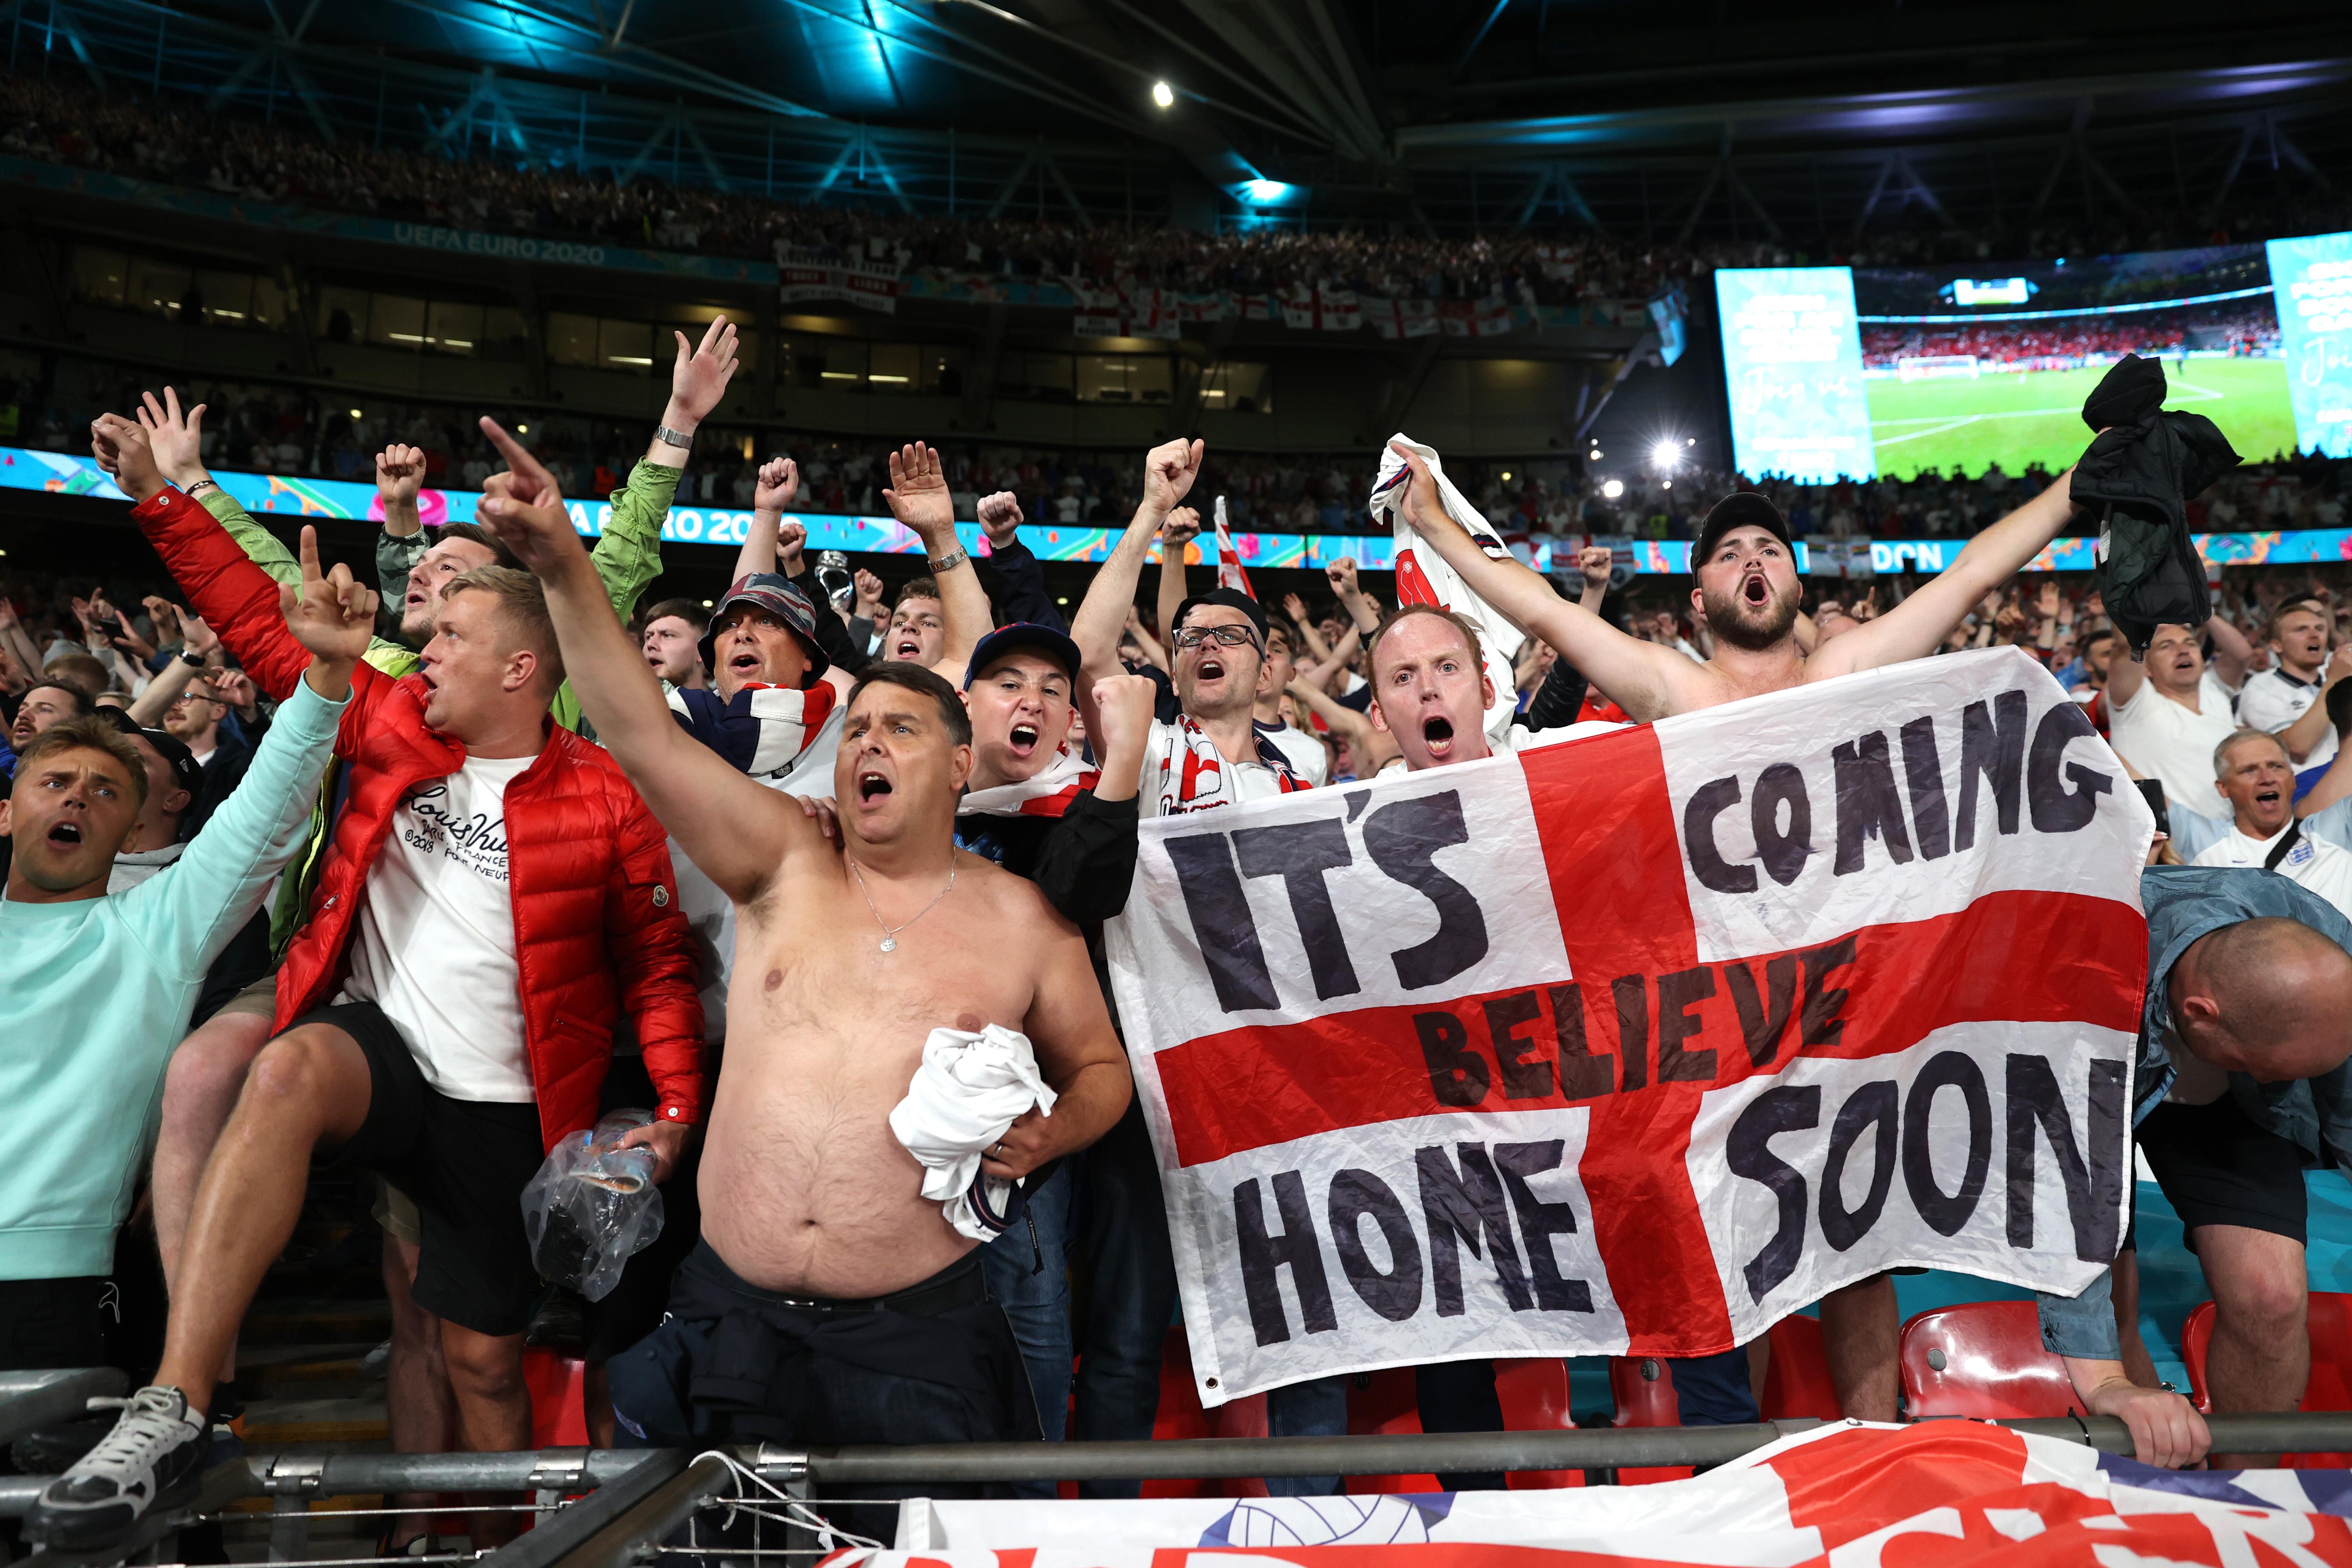 Soccer Football - Euro 2020 - Semi Final - England v Denmark - Wembley Stadium, London, Britain - July 7, 2021 England fans celebrate after the match Pool via REUTERS/Carl Recine